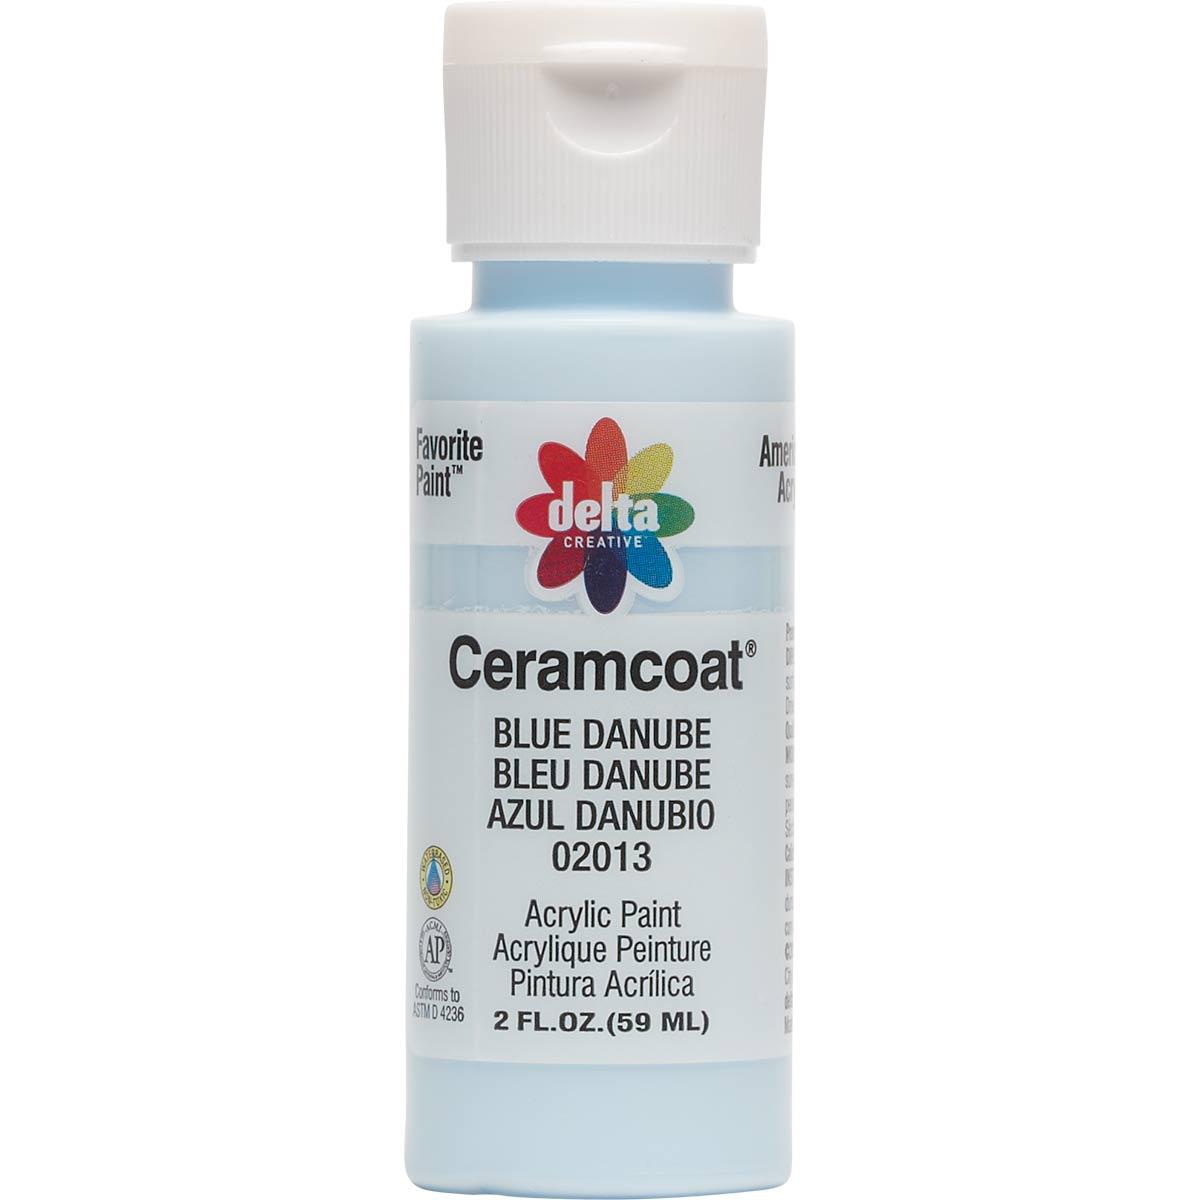 Delta Ceramcoat ® Acrylic Paint - Blue Danube, 2 oz.